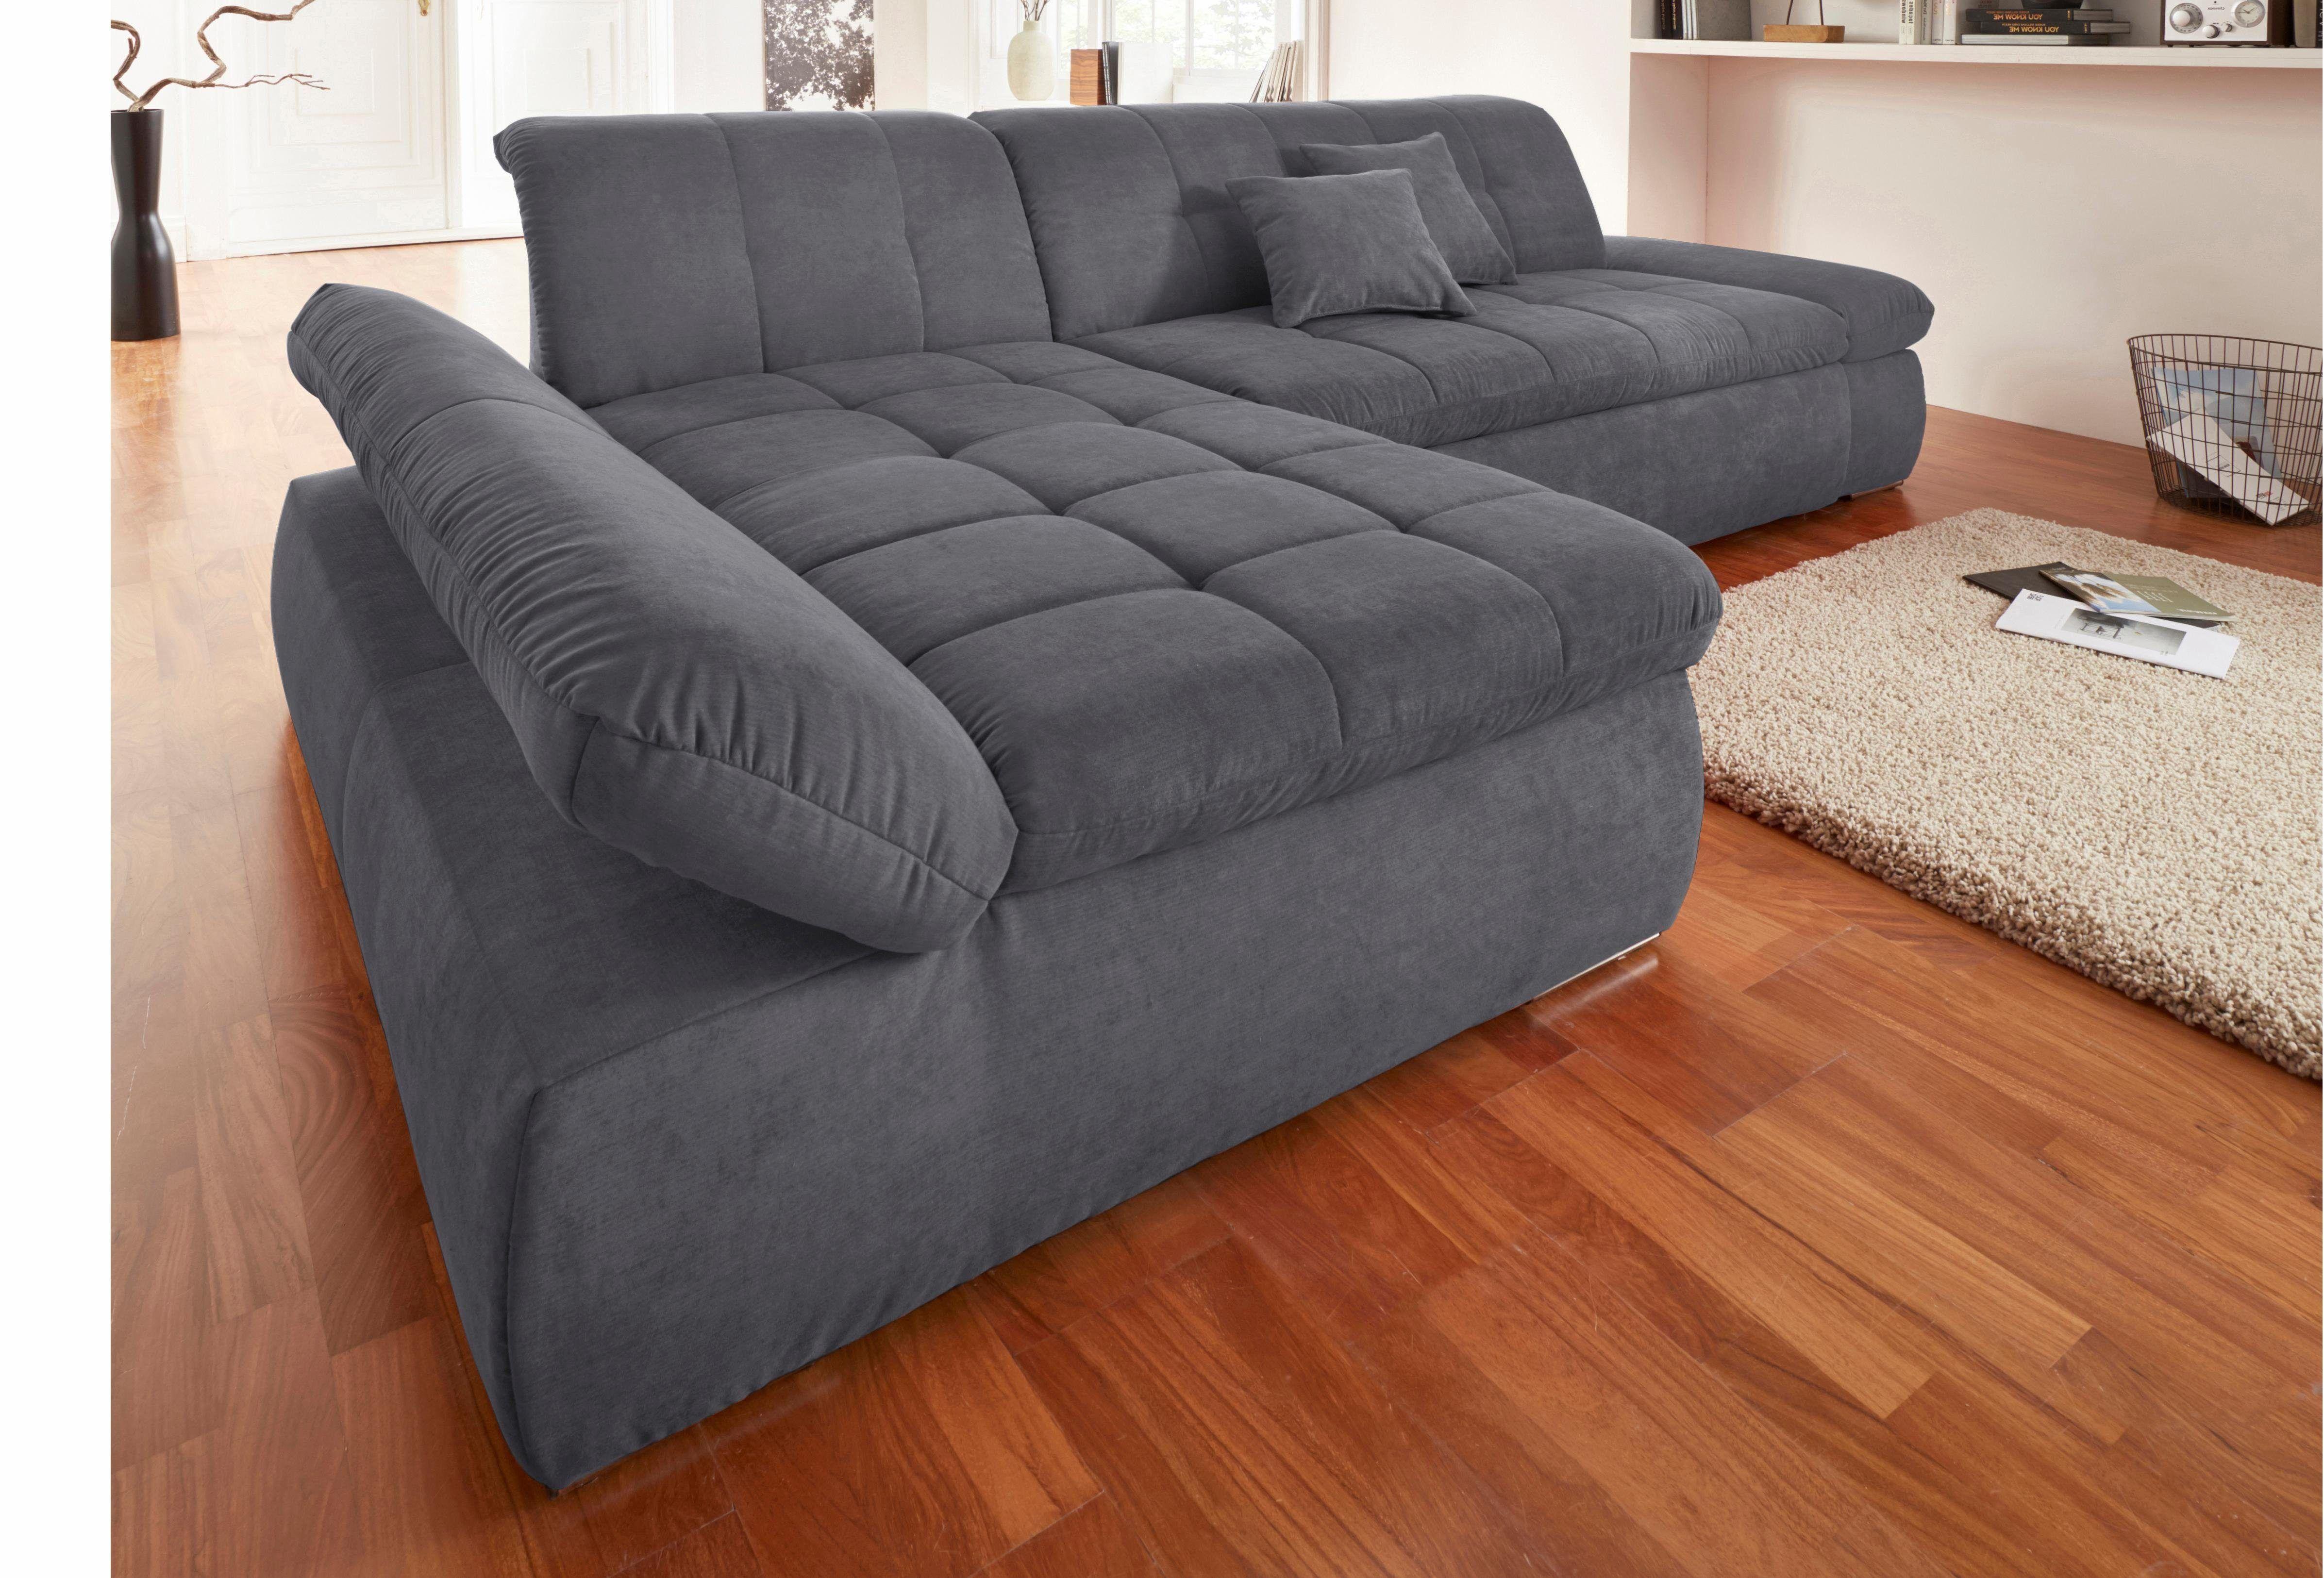 Eckcouch grau schwarz  Stoffsofa ARI Ecksofa in grau | möbel | furniture | Pinterest | Html